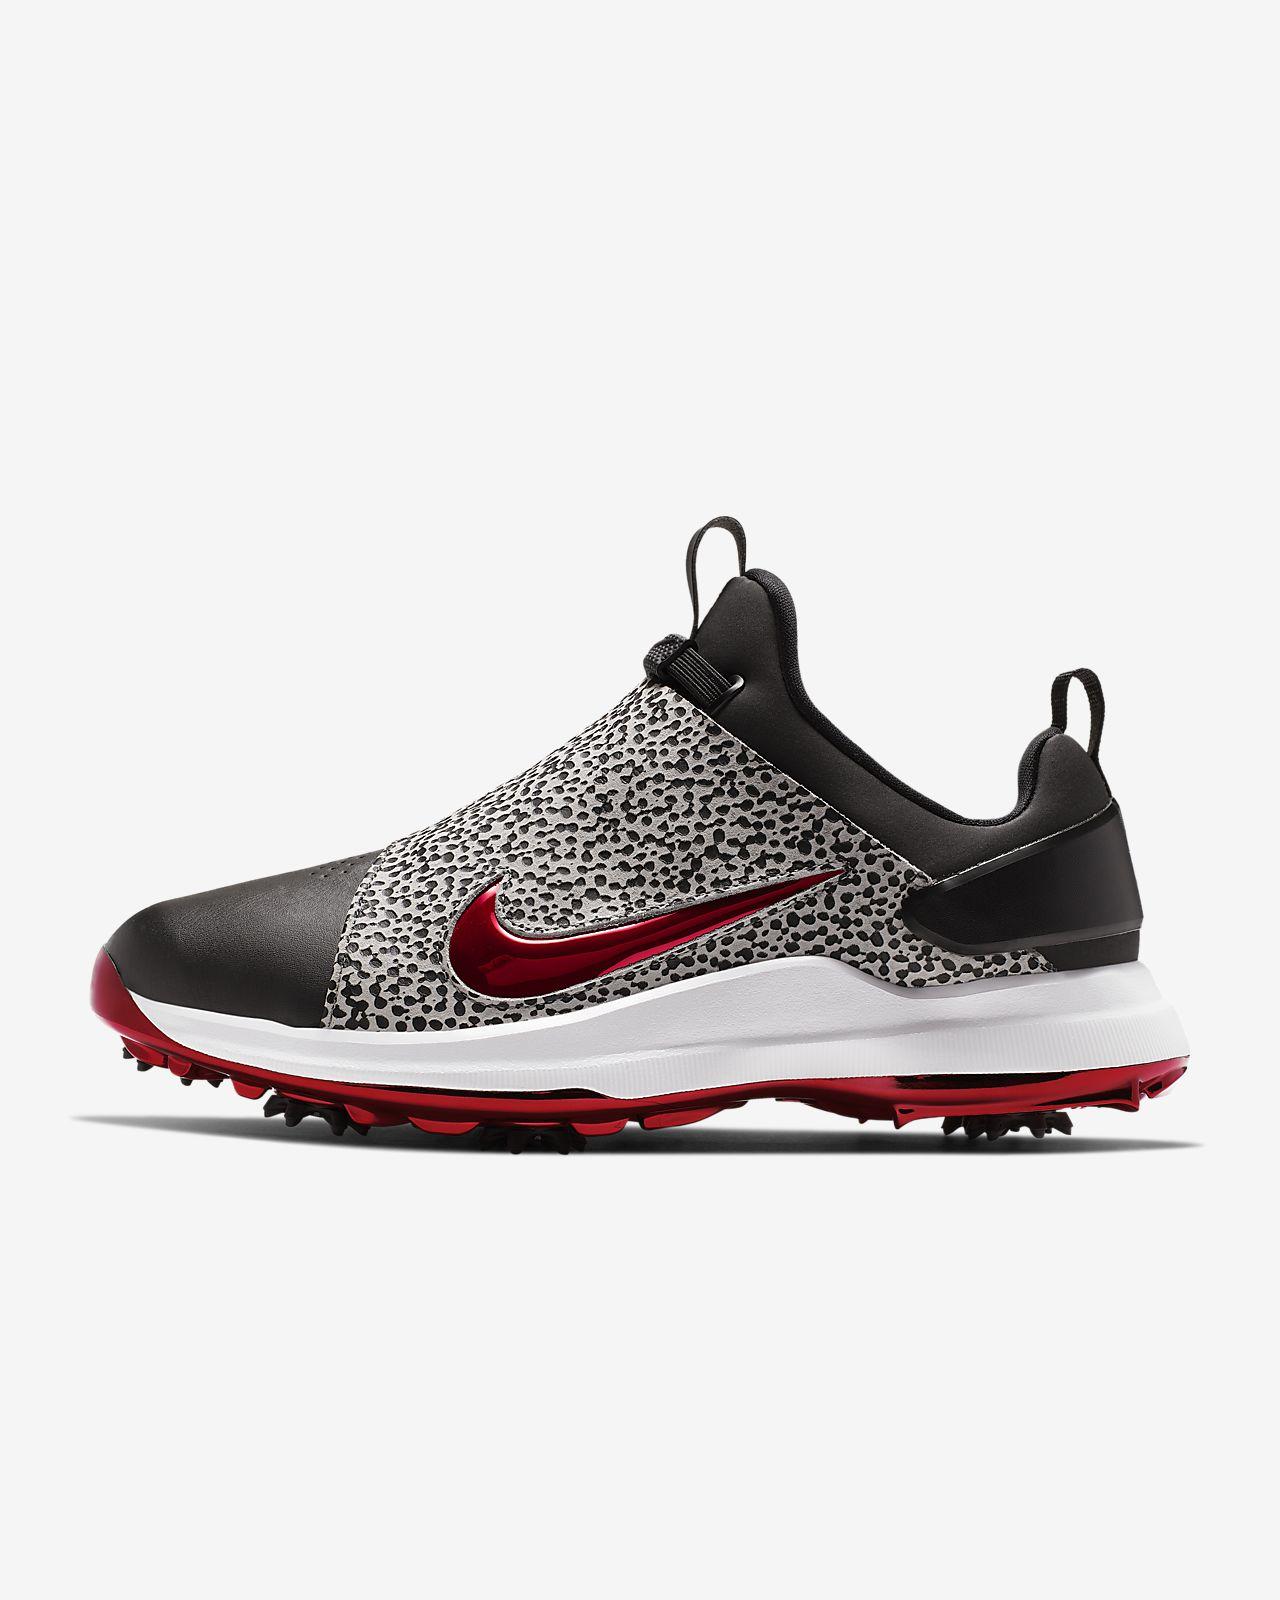 8798070443e Ανδρικό παπούτσι γκολφ Nike Tour Premiere NRG. Nike.com GR